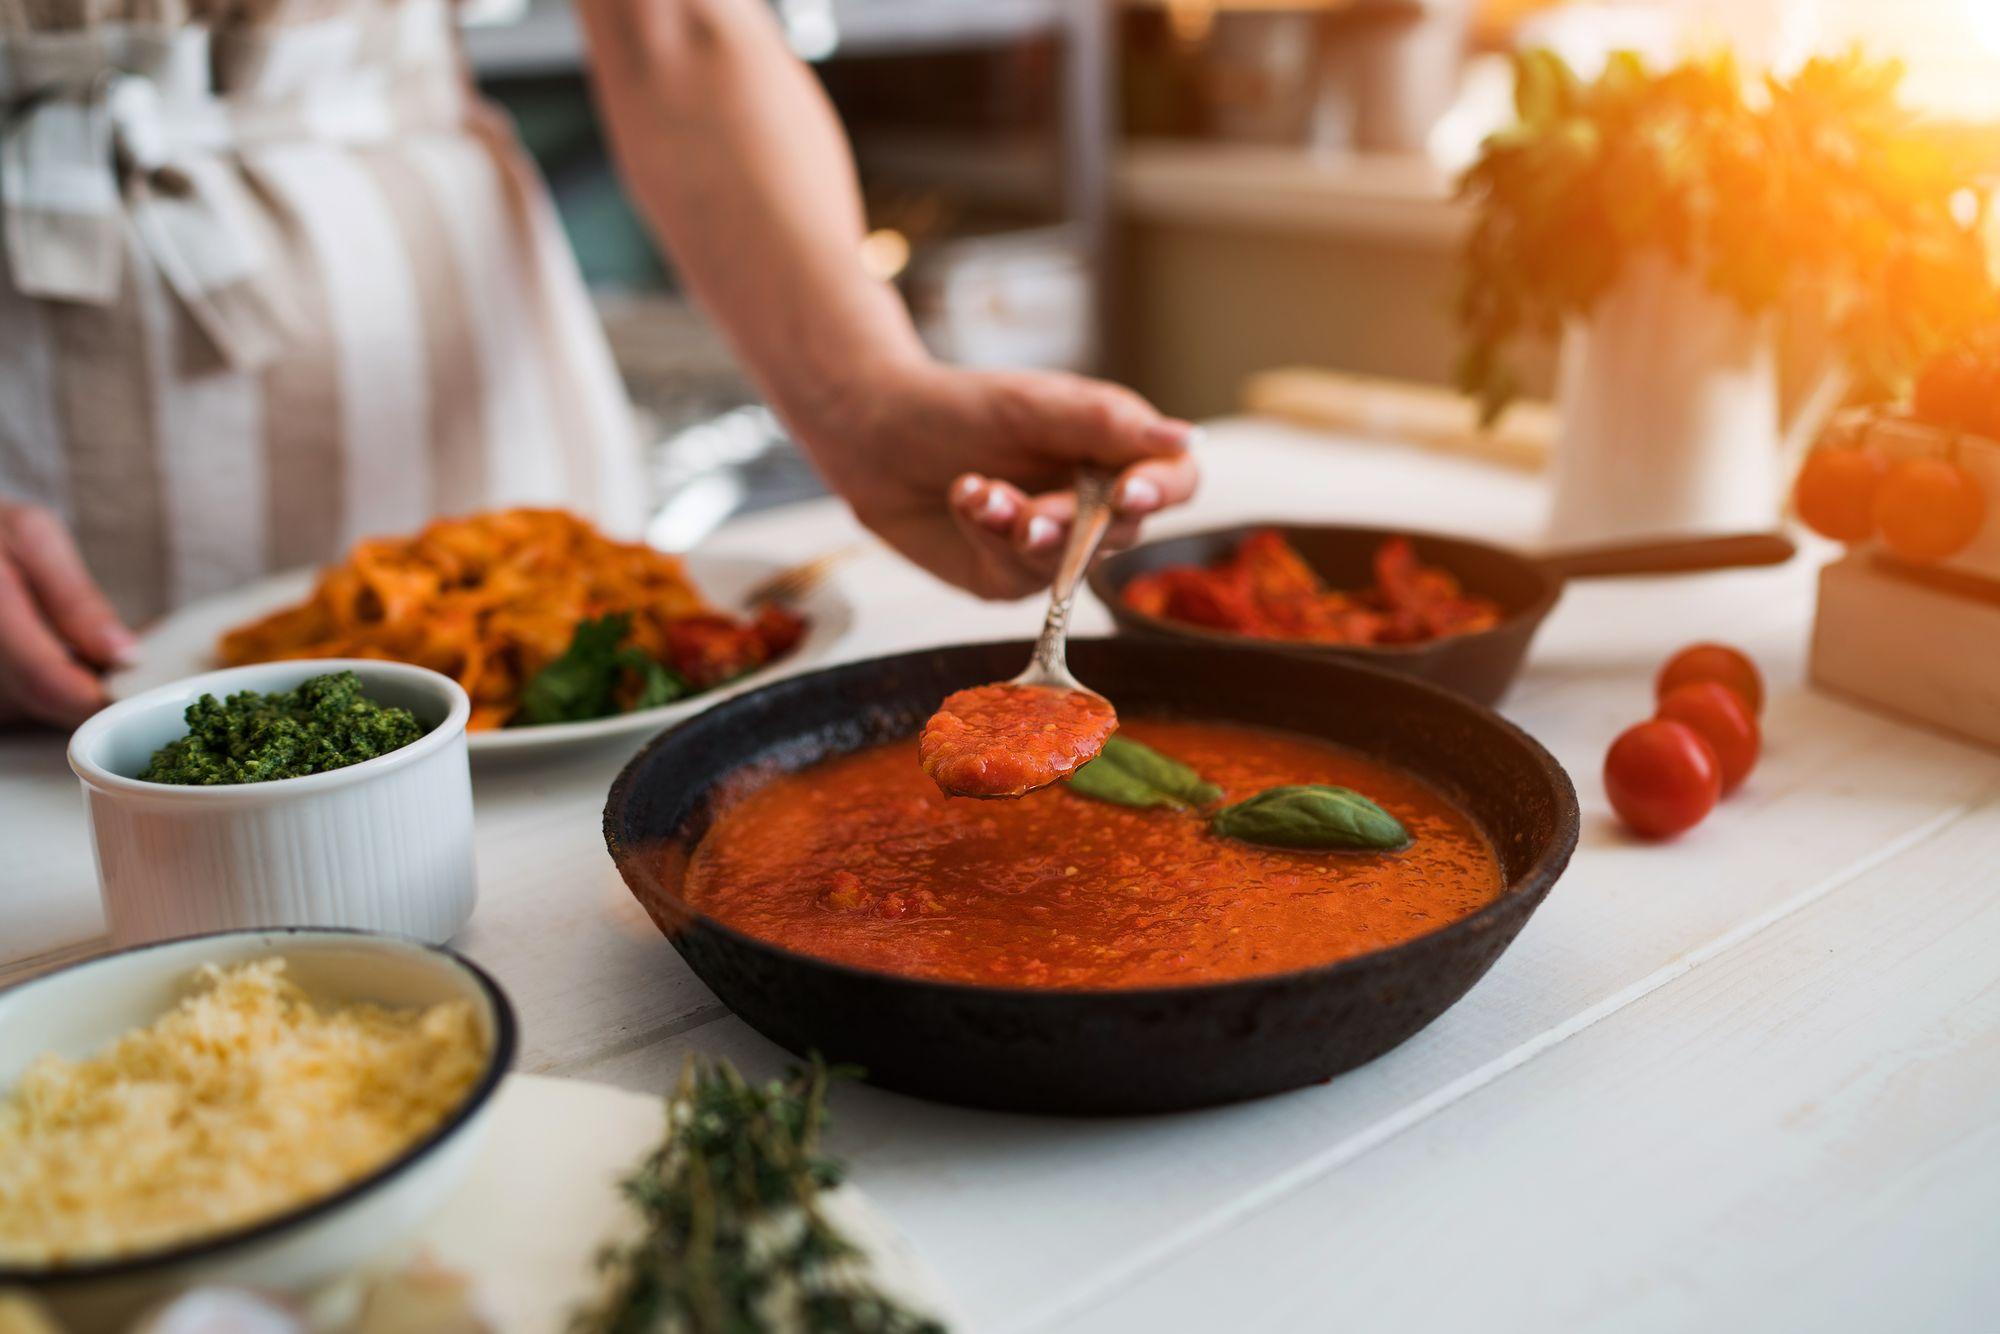 tomato-based-sauce